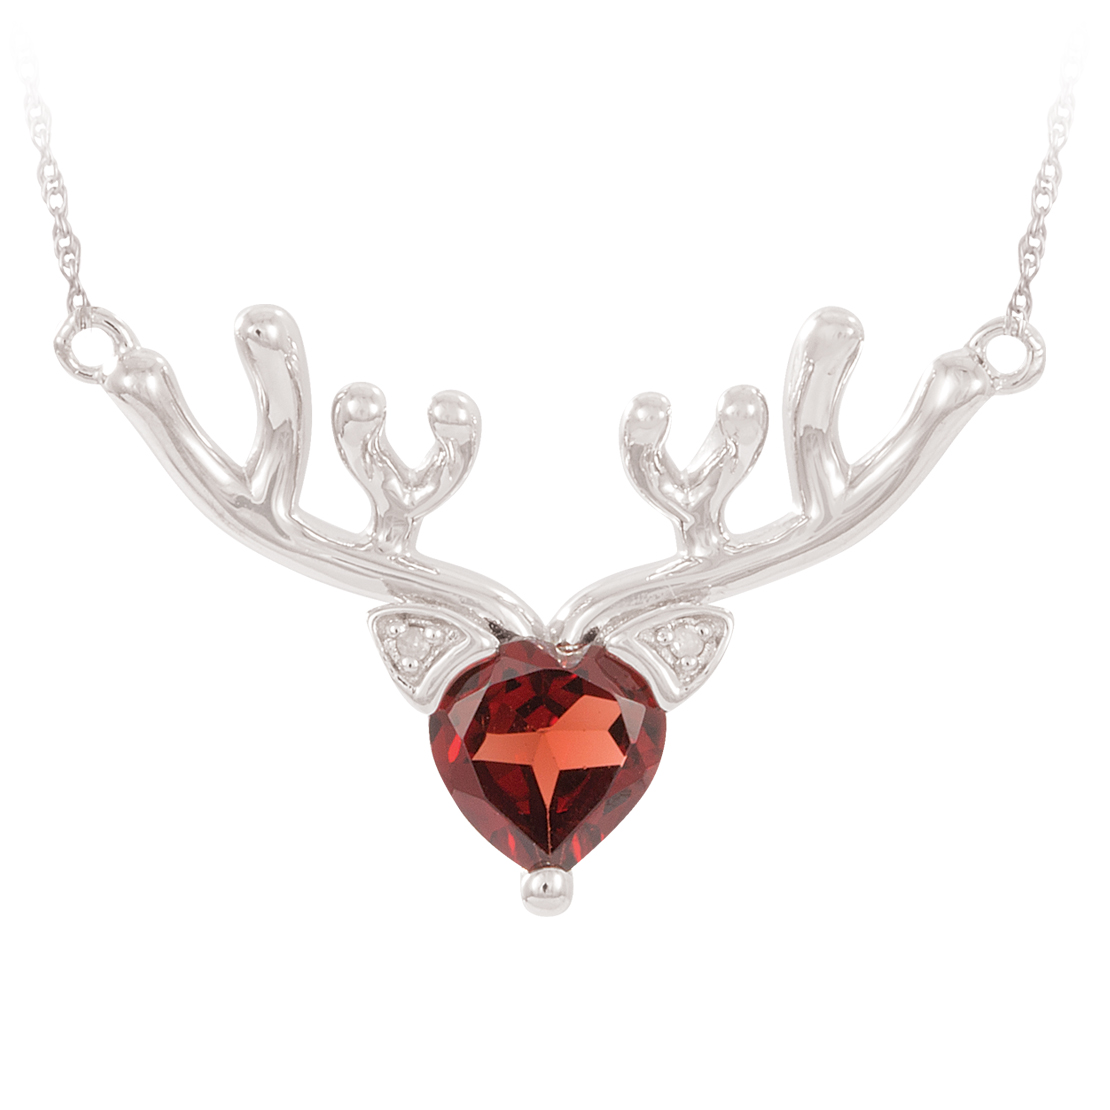 Rudolph Silver and Garnet Pendant